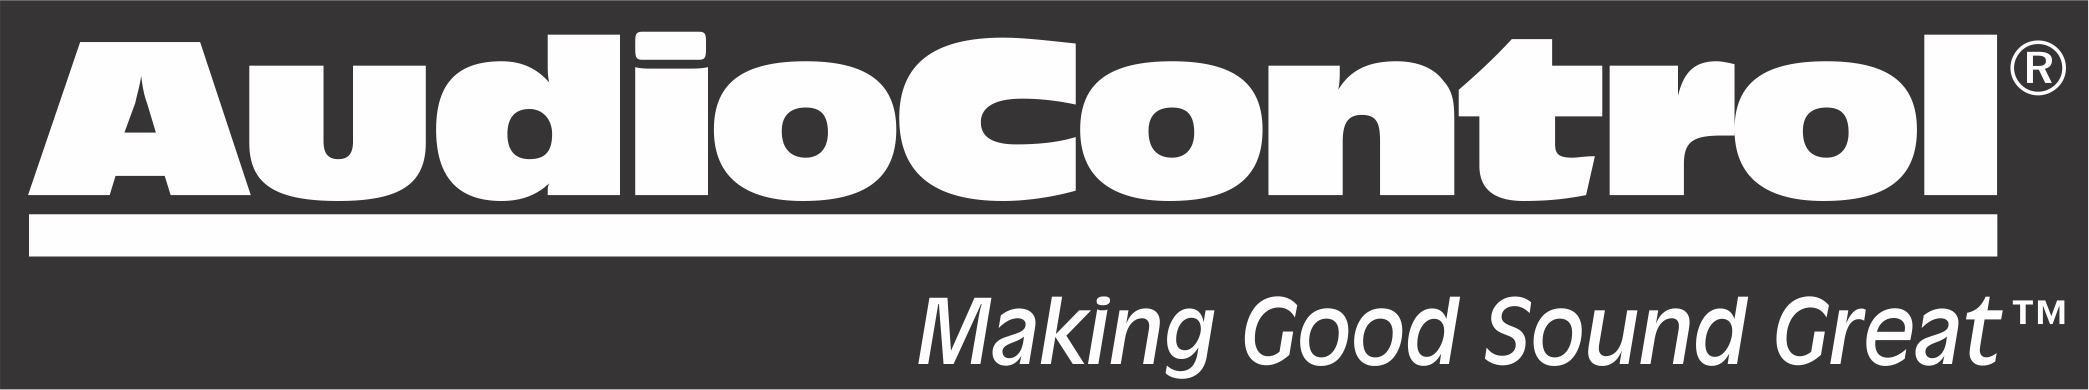 AudCon-Logo-wTag-Black.jpg